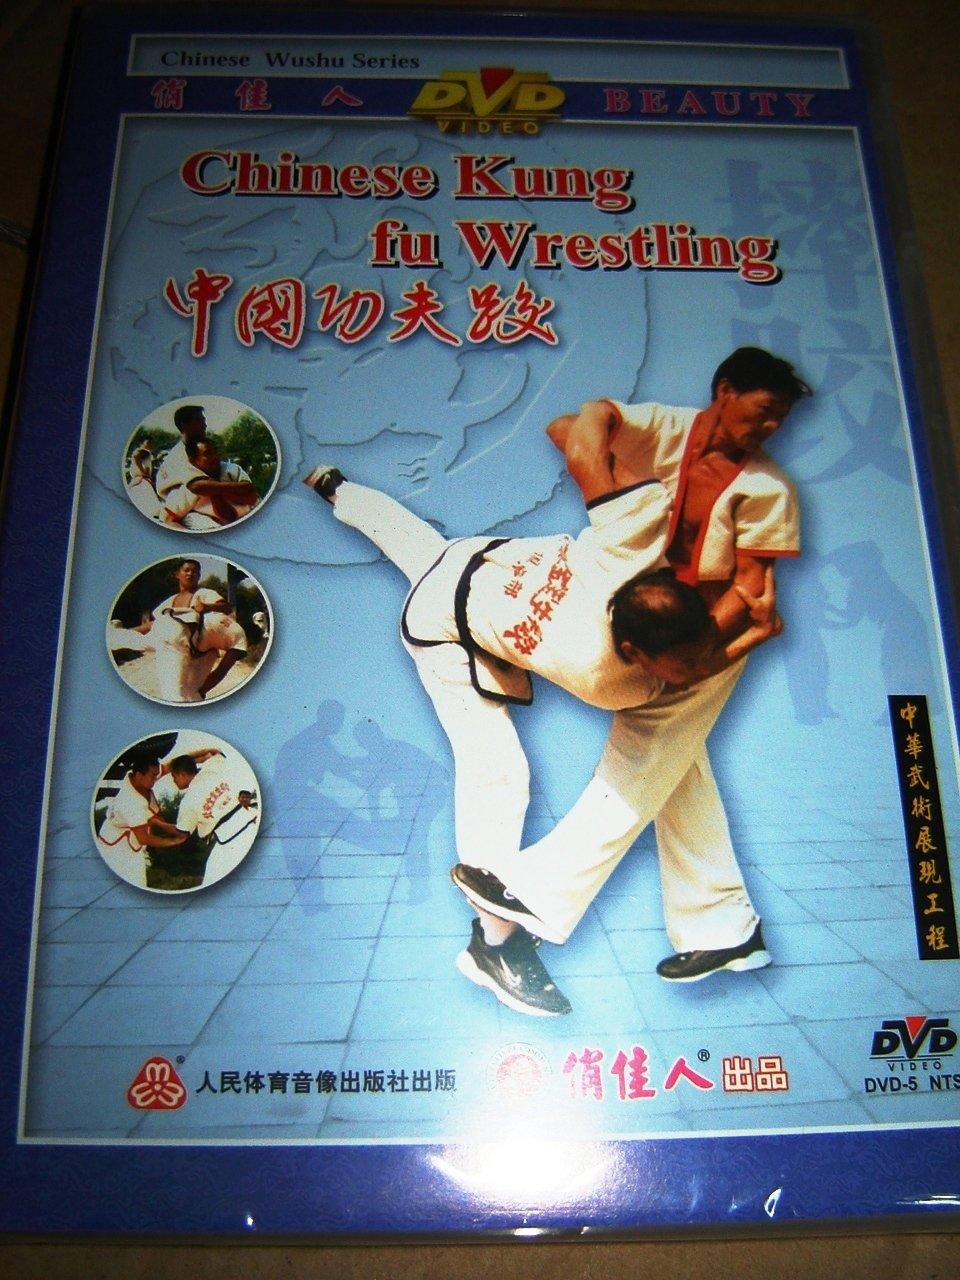 c9f5fe6bf Amazon.com: Chinese Wushu Series Chinese Kungfu Wrestling DVD: Guangzhou  Beauty Culture Communication Co.Ltd: Movies & TV